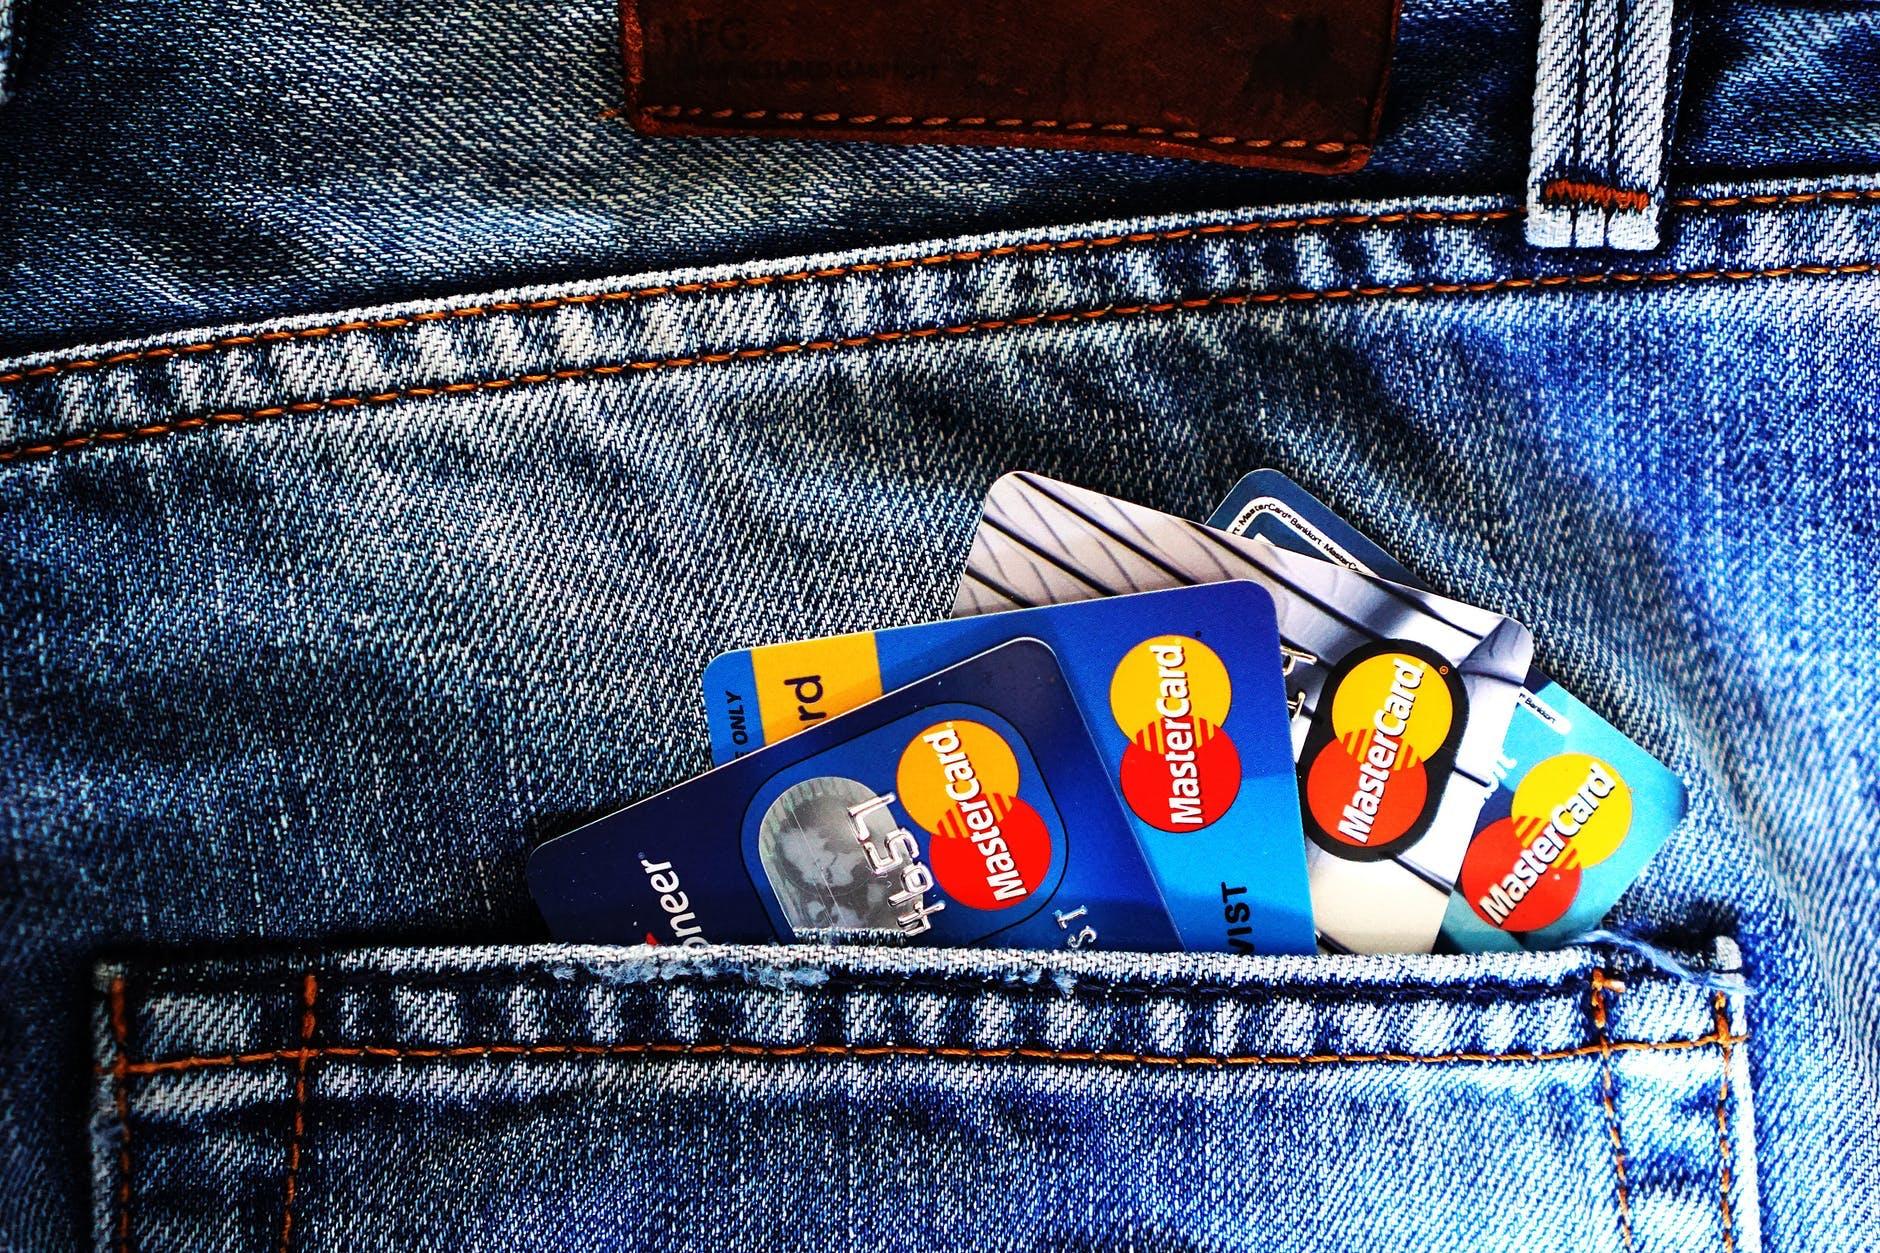 Credit cards in a jeans back pocket